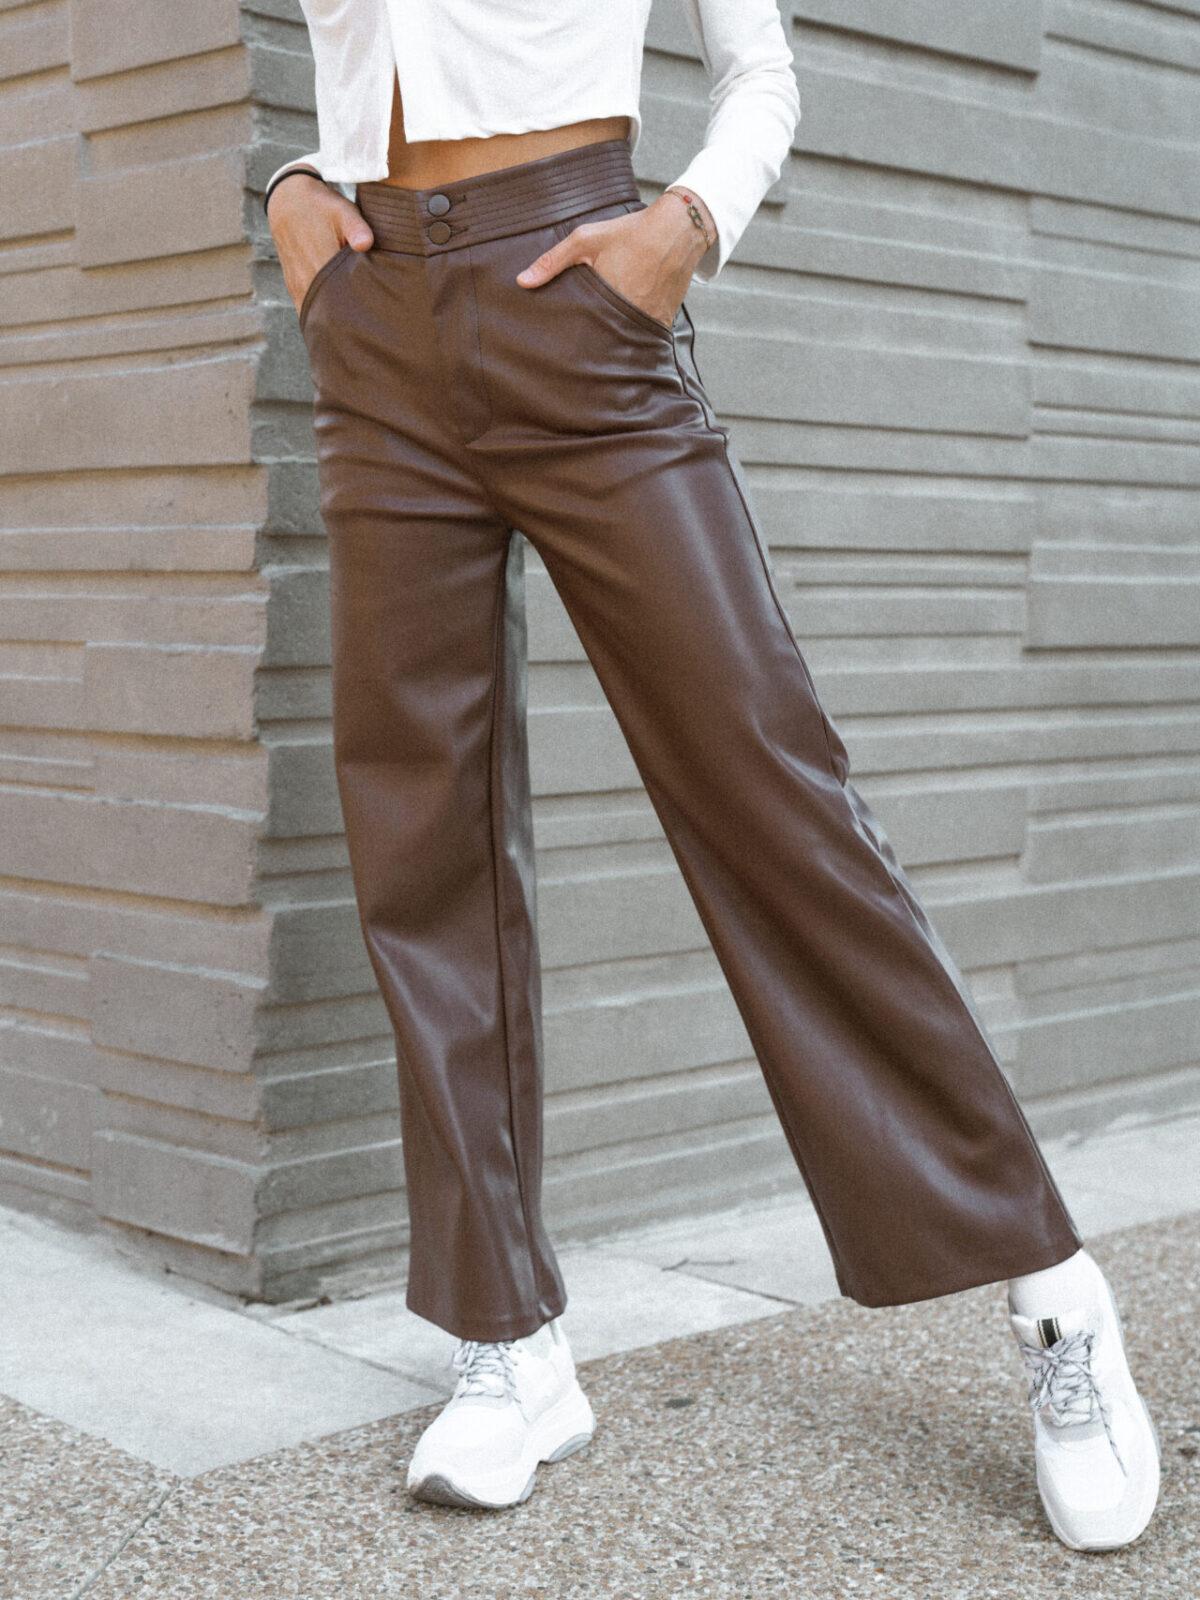 pantalon-simili-cuir-marron-chocolat-femme-gisette-store (16)